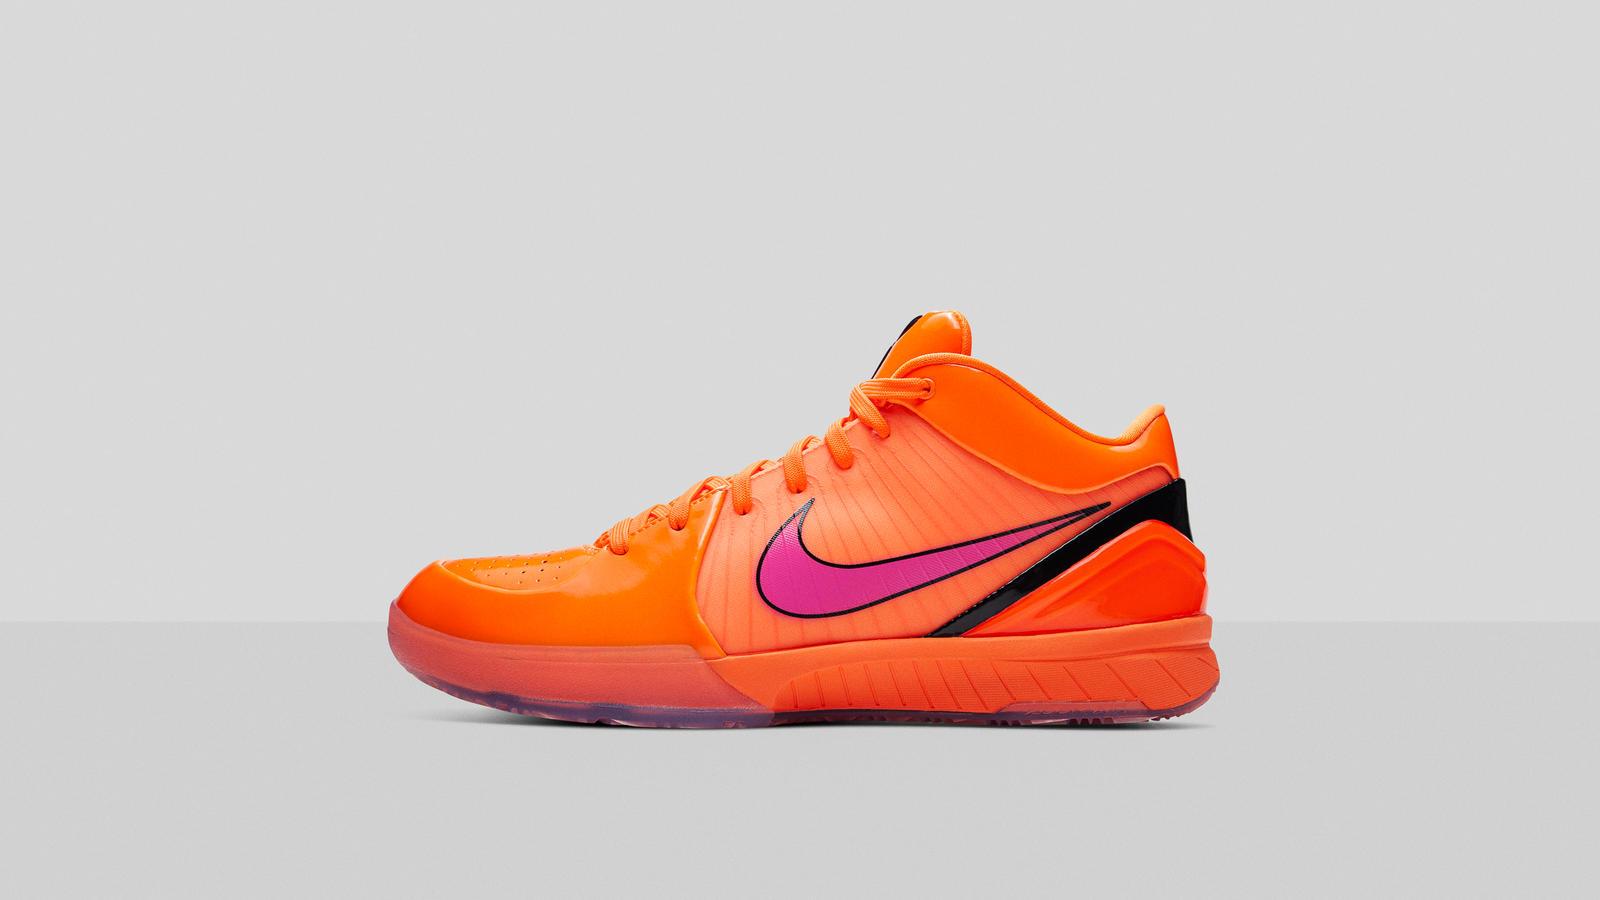 FeaturedFootwear_WNBA_ASG2019-2229_89480.jpg